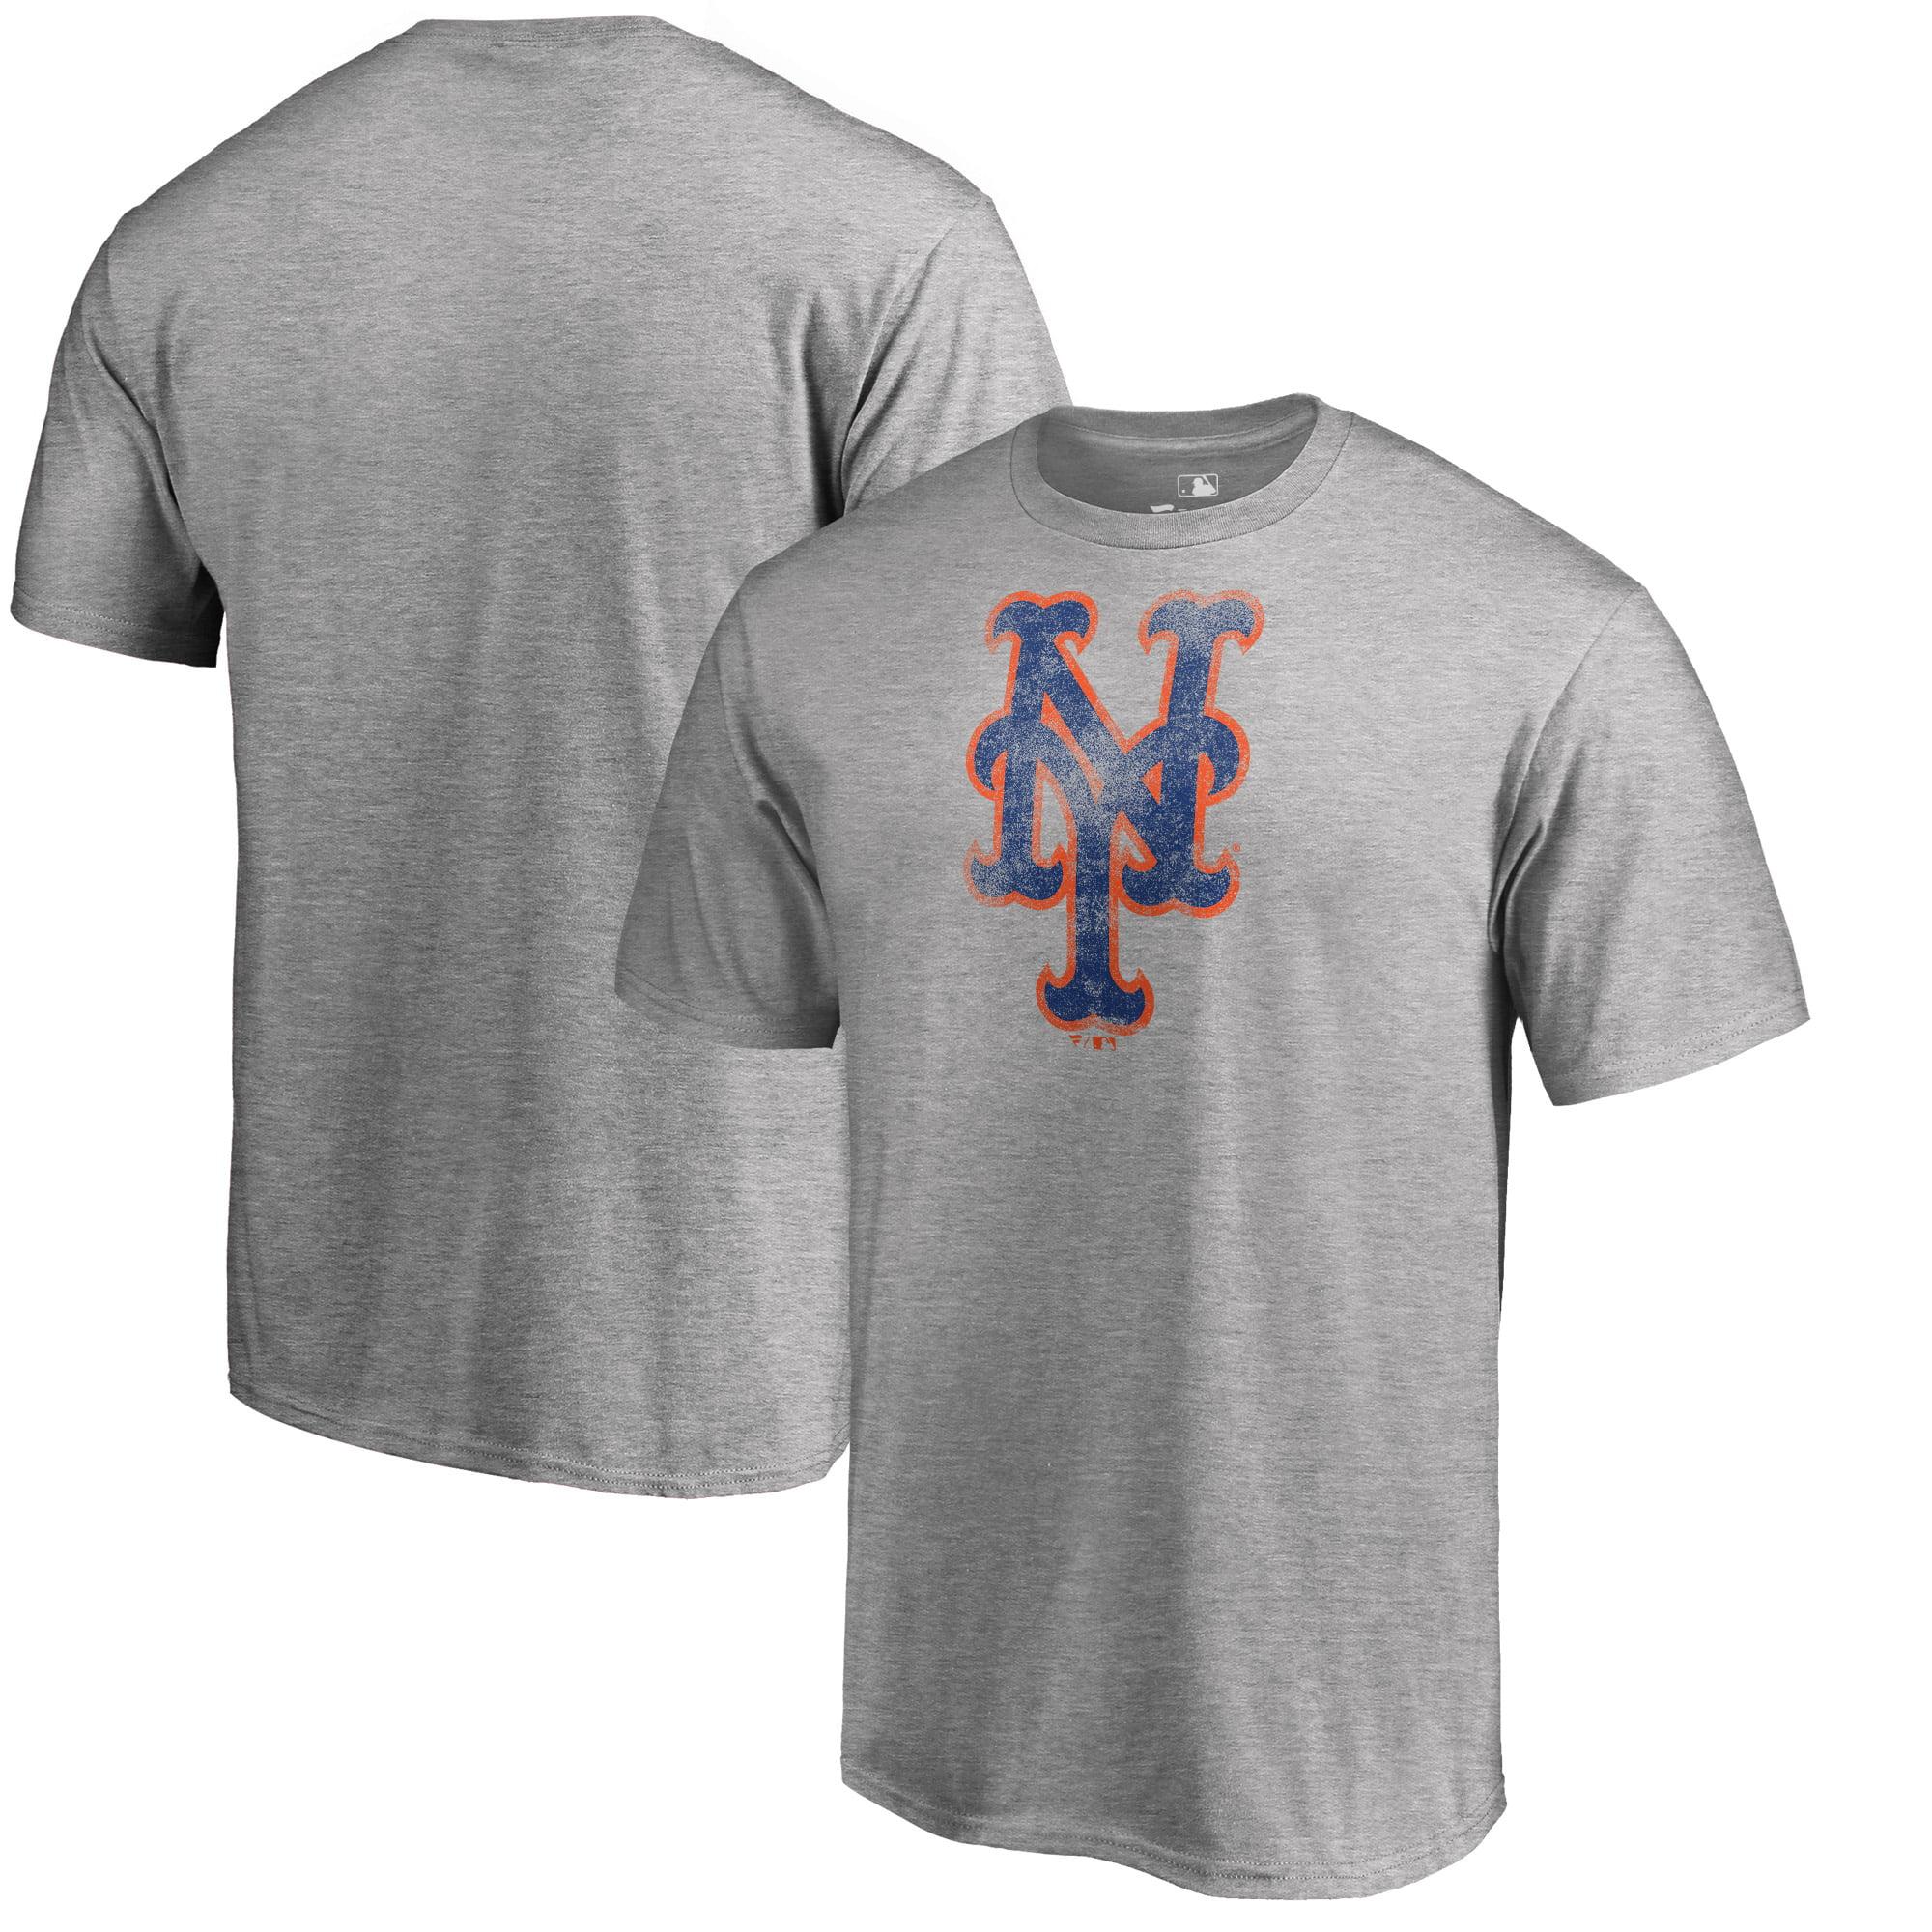 New York Mets Fanatics Branded Big & Tall Distressed Team T-Shirt - Heathered Gray